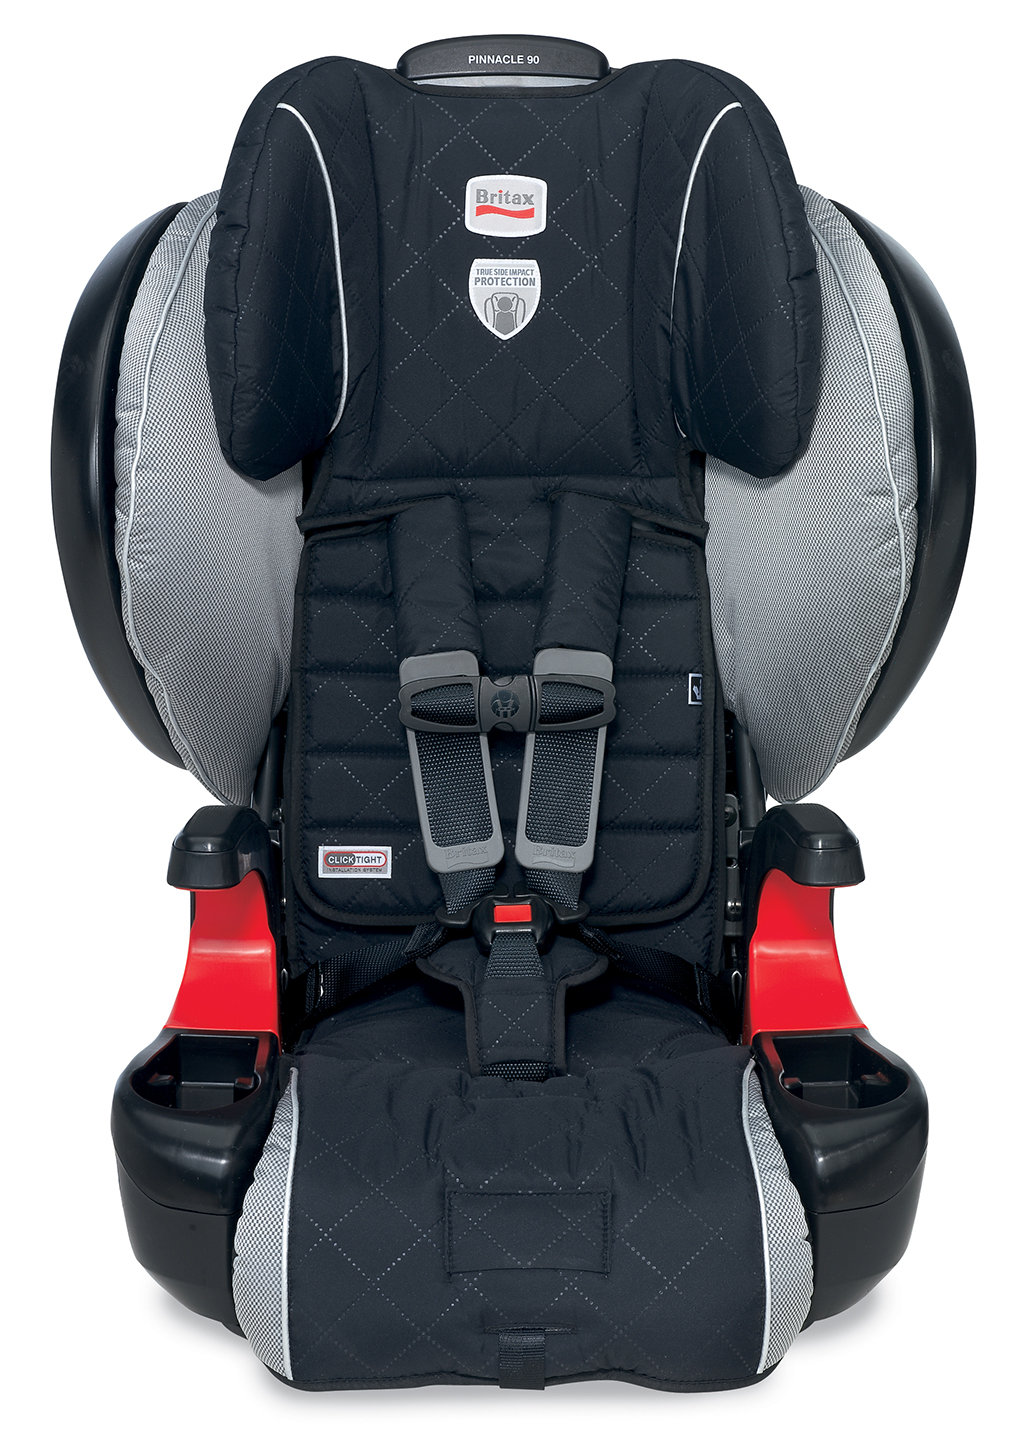 Amazon.com : Britax Pinnacle 90 Booster Car Seat